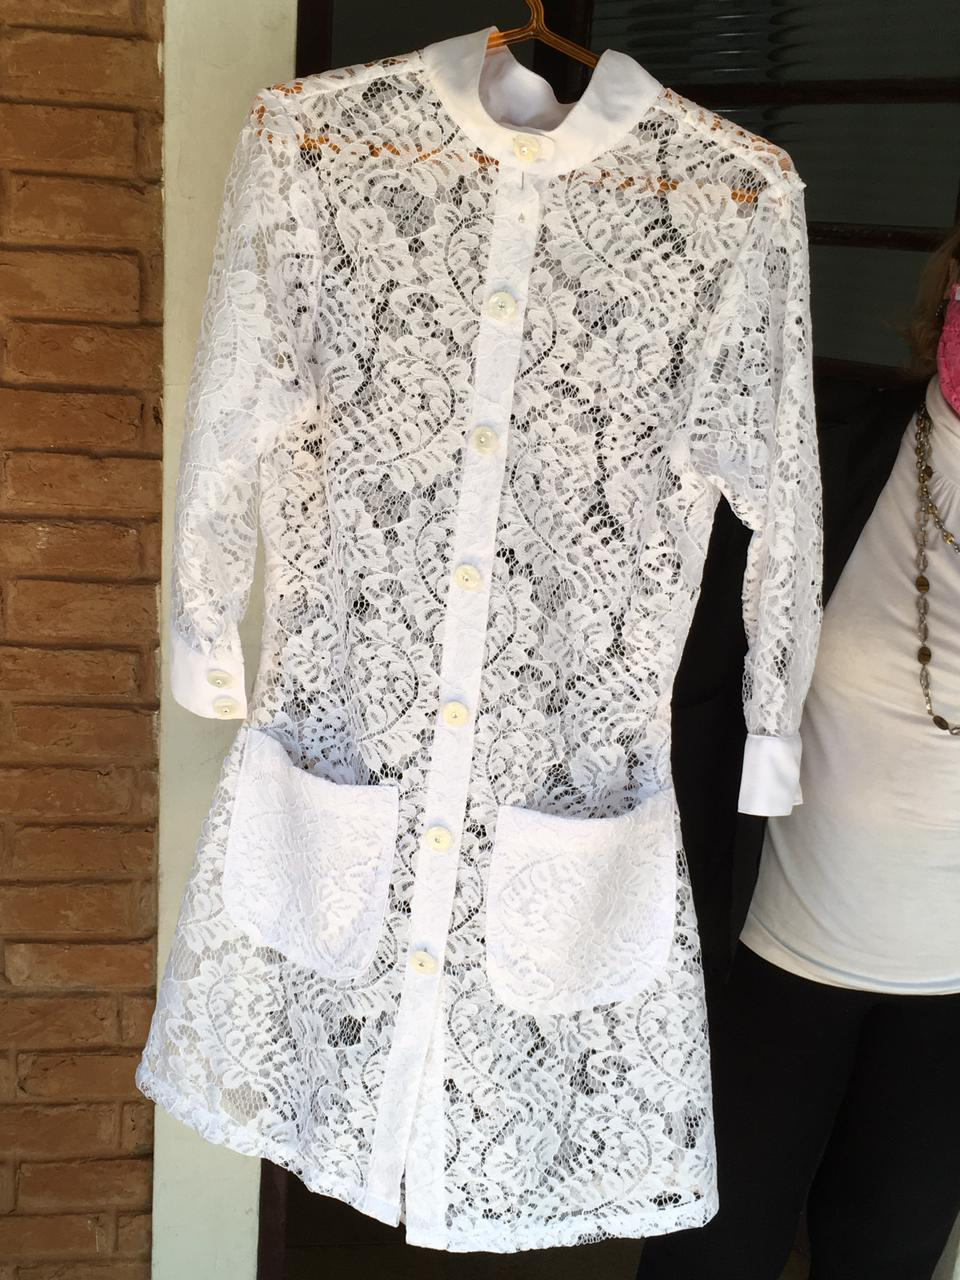 Jaleco Carol  - Luxo Branco - Jalecos Personalizado Feminino